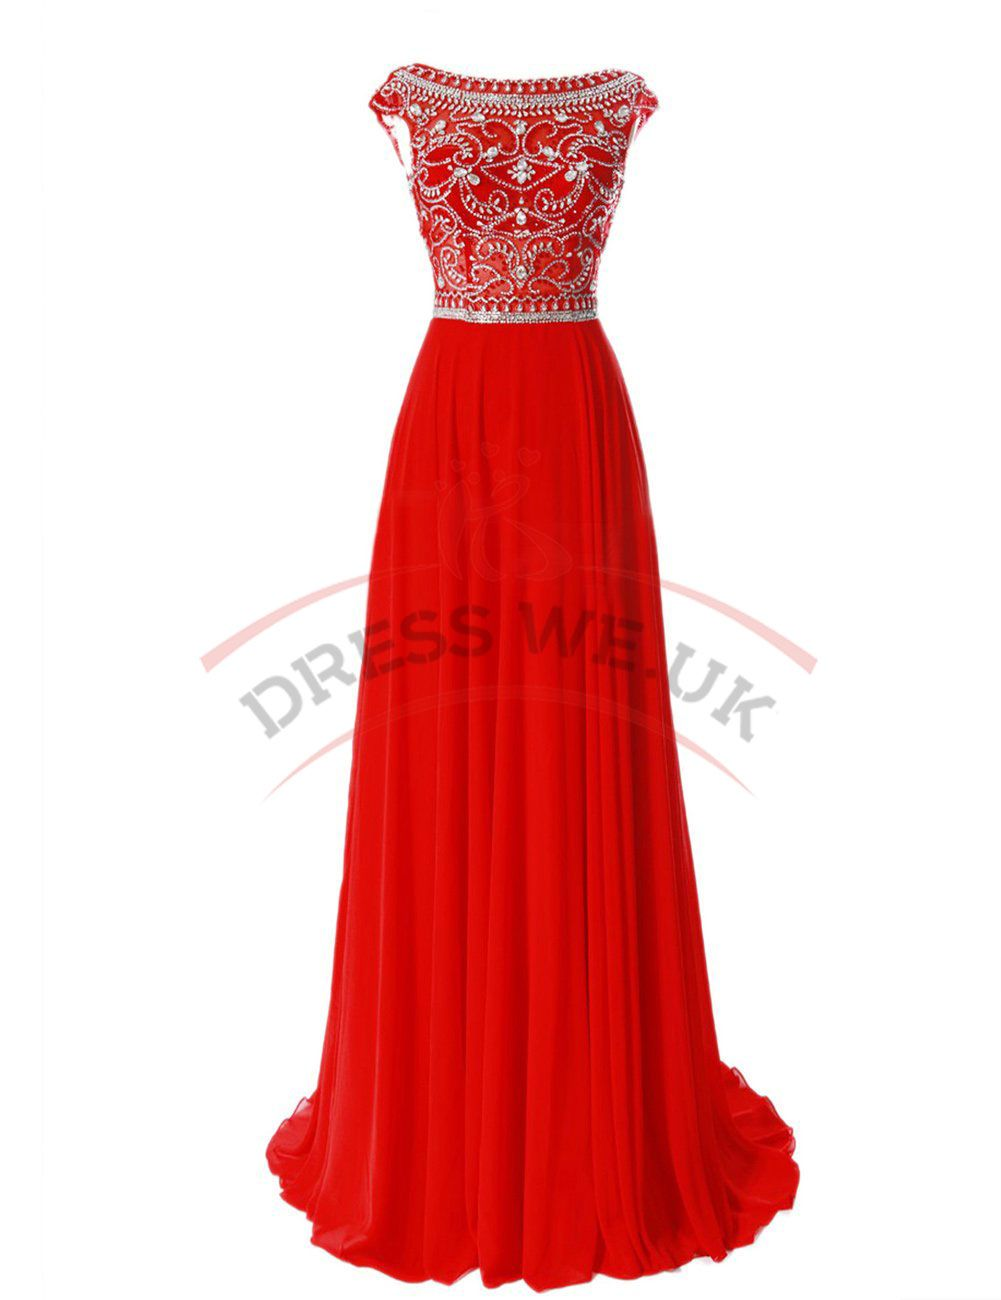 Elegant red prom dressesfloor length prom dresseschiffon prom